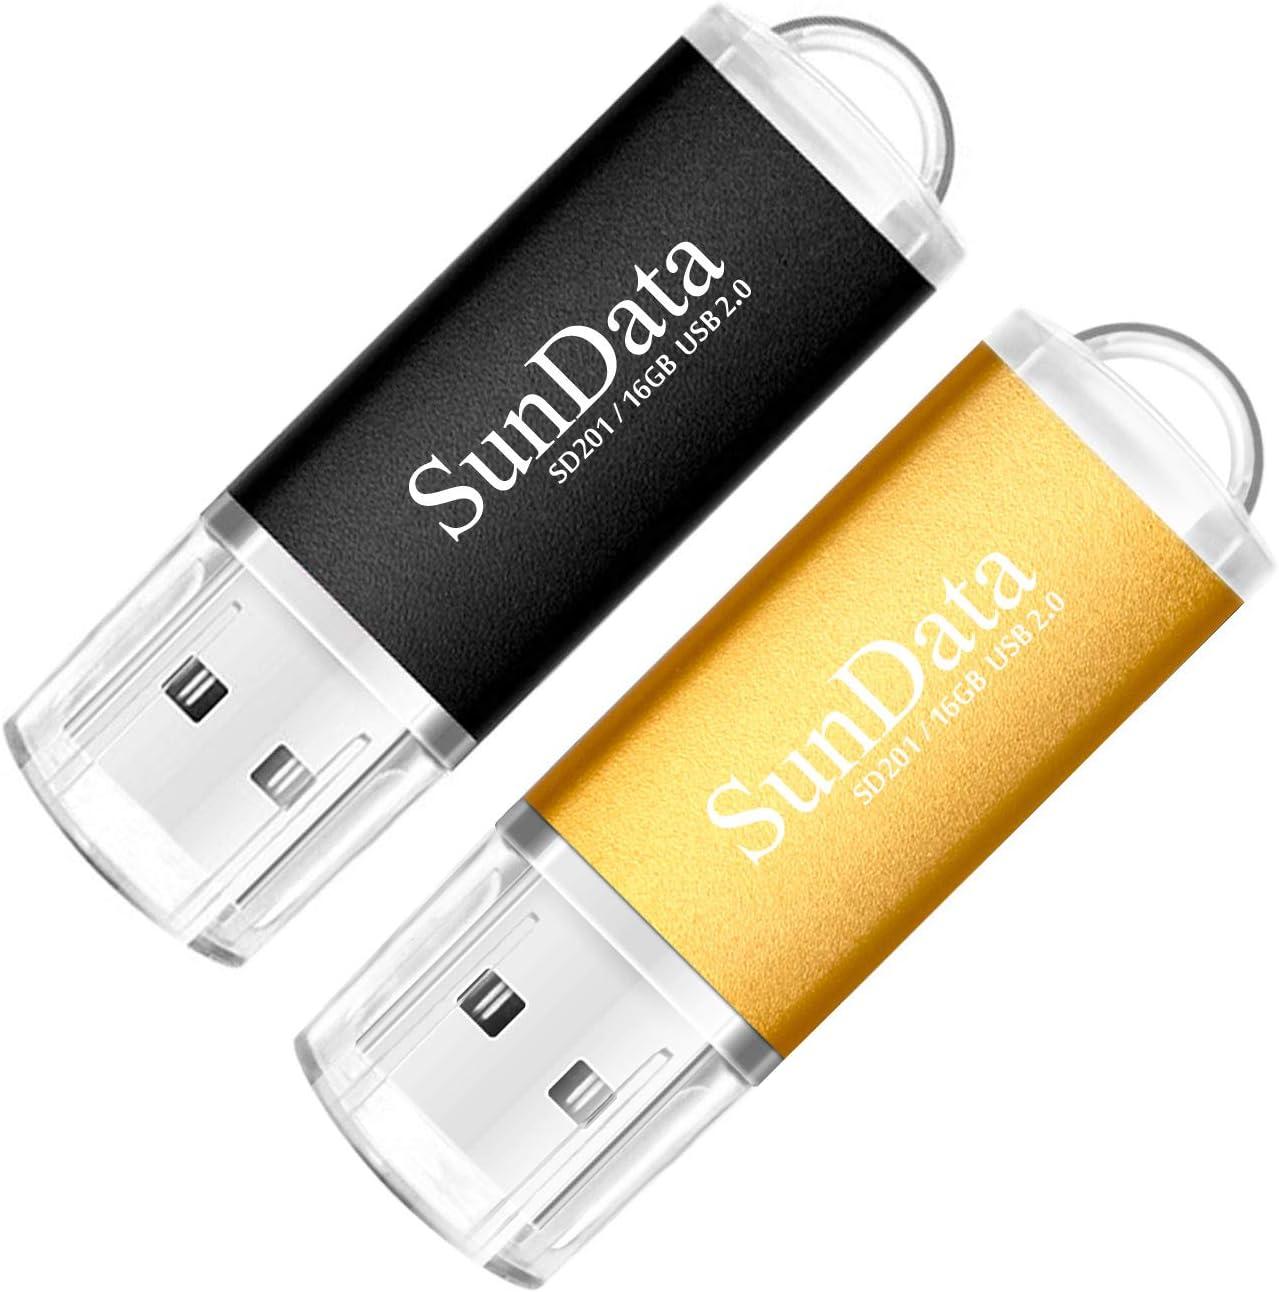 SunData Memorias USB 2 Piezas 16GB PenDrives 16GB Unidad Flash USB2.0 Pen Drive con Luz LED (2 Colores: Negro Oro)